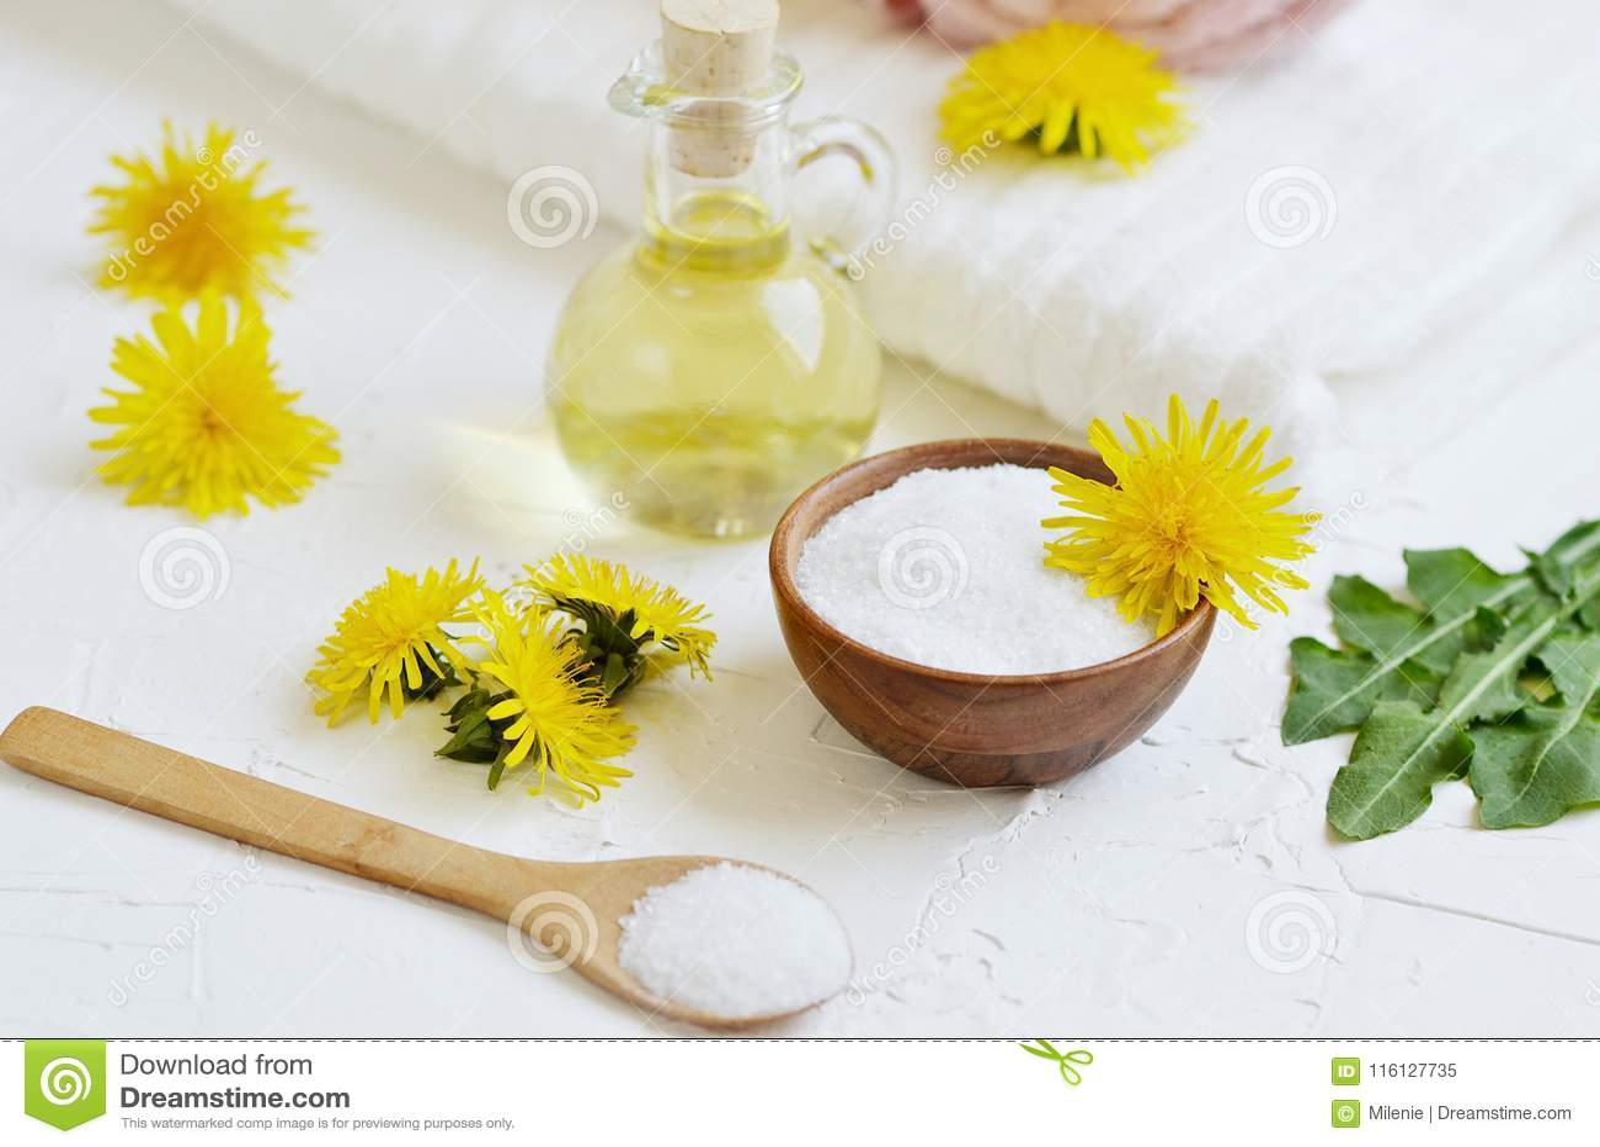 Natural ingredients for homemade body salt scrub with dandelion flowers, lemon, honey and olive oil